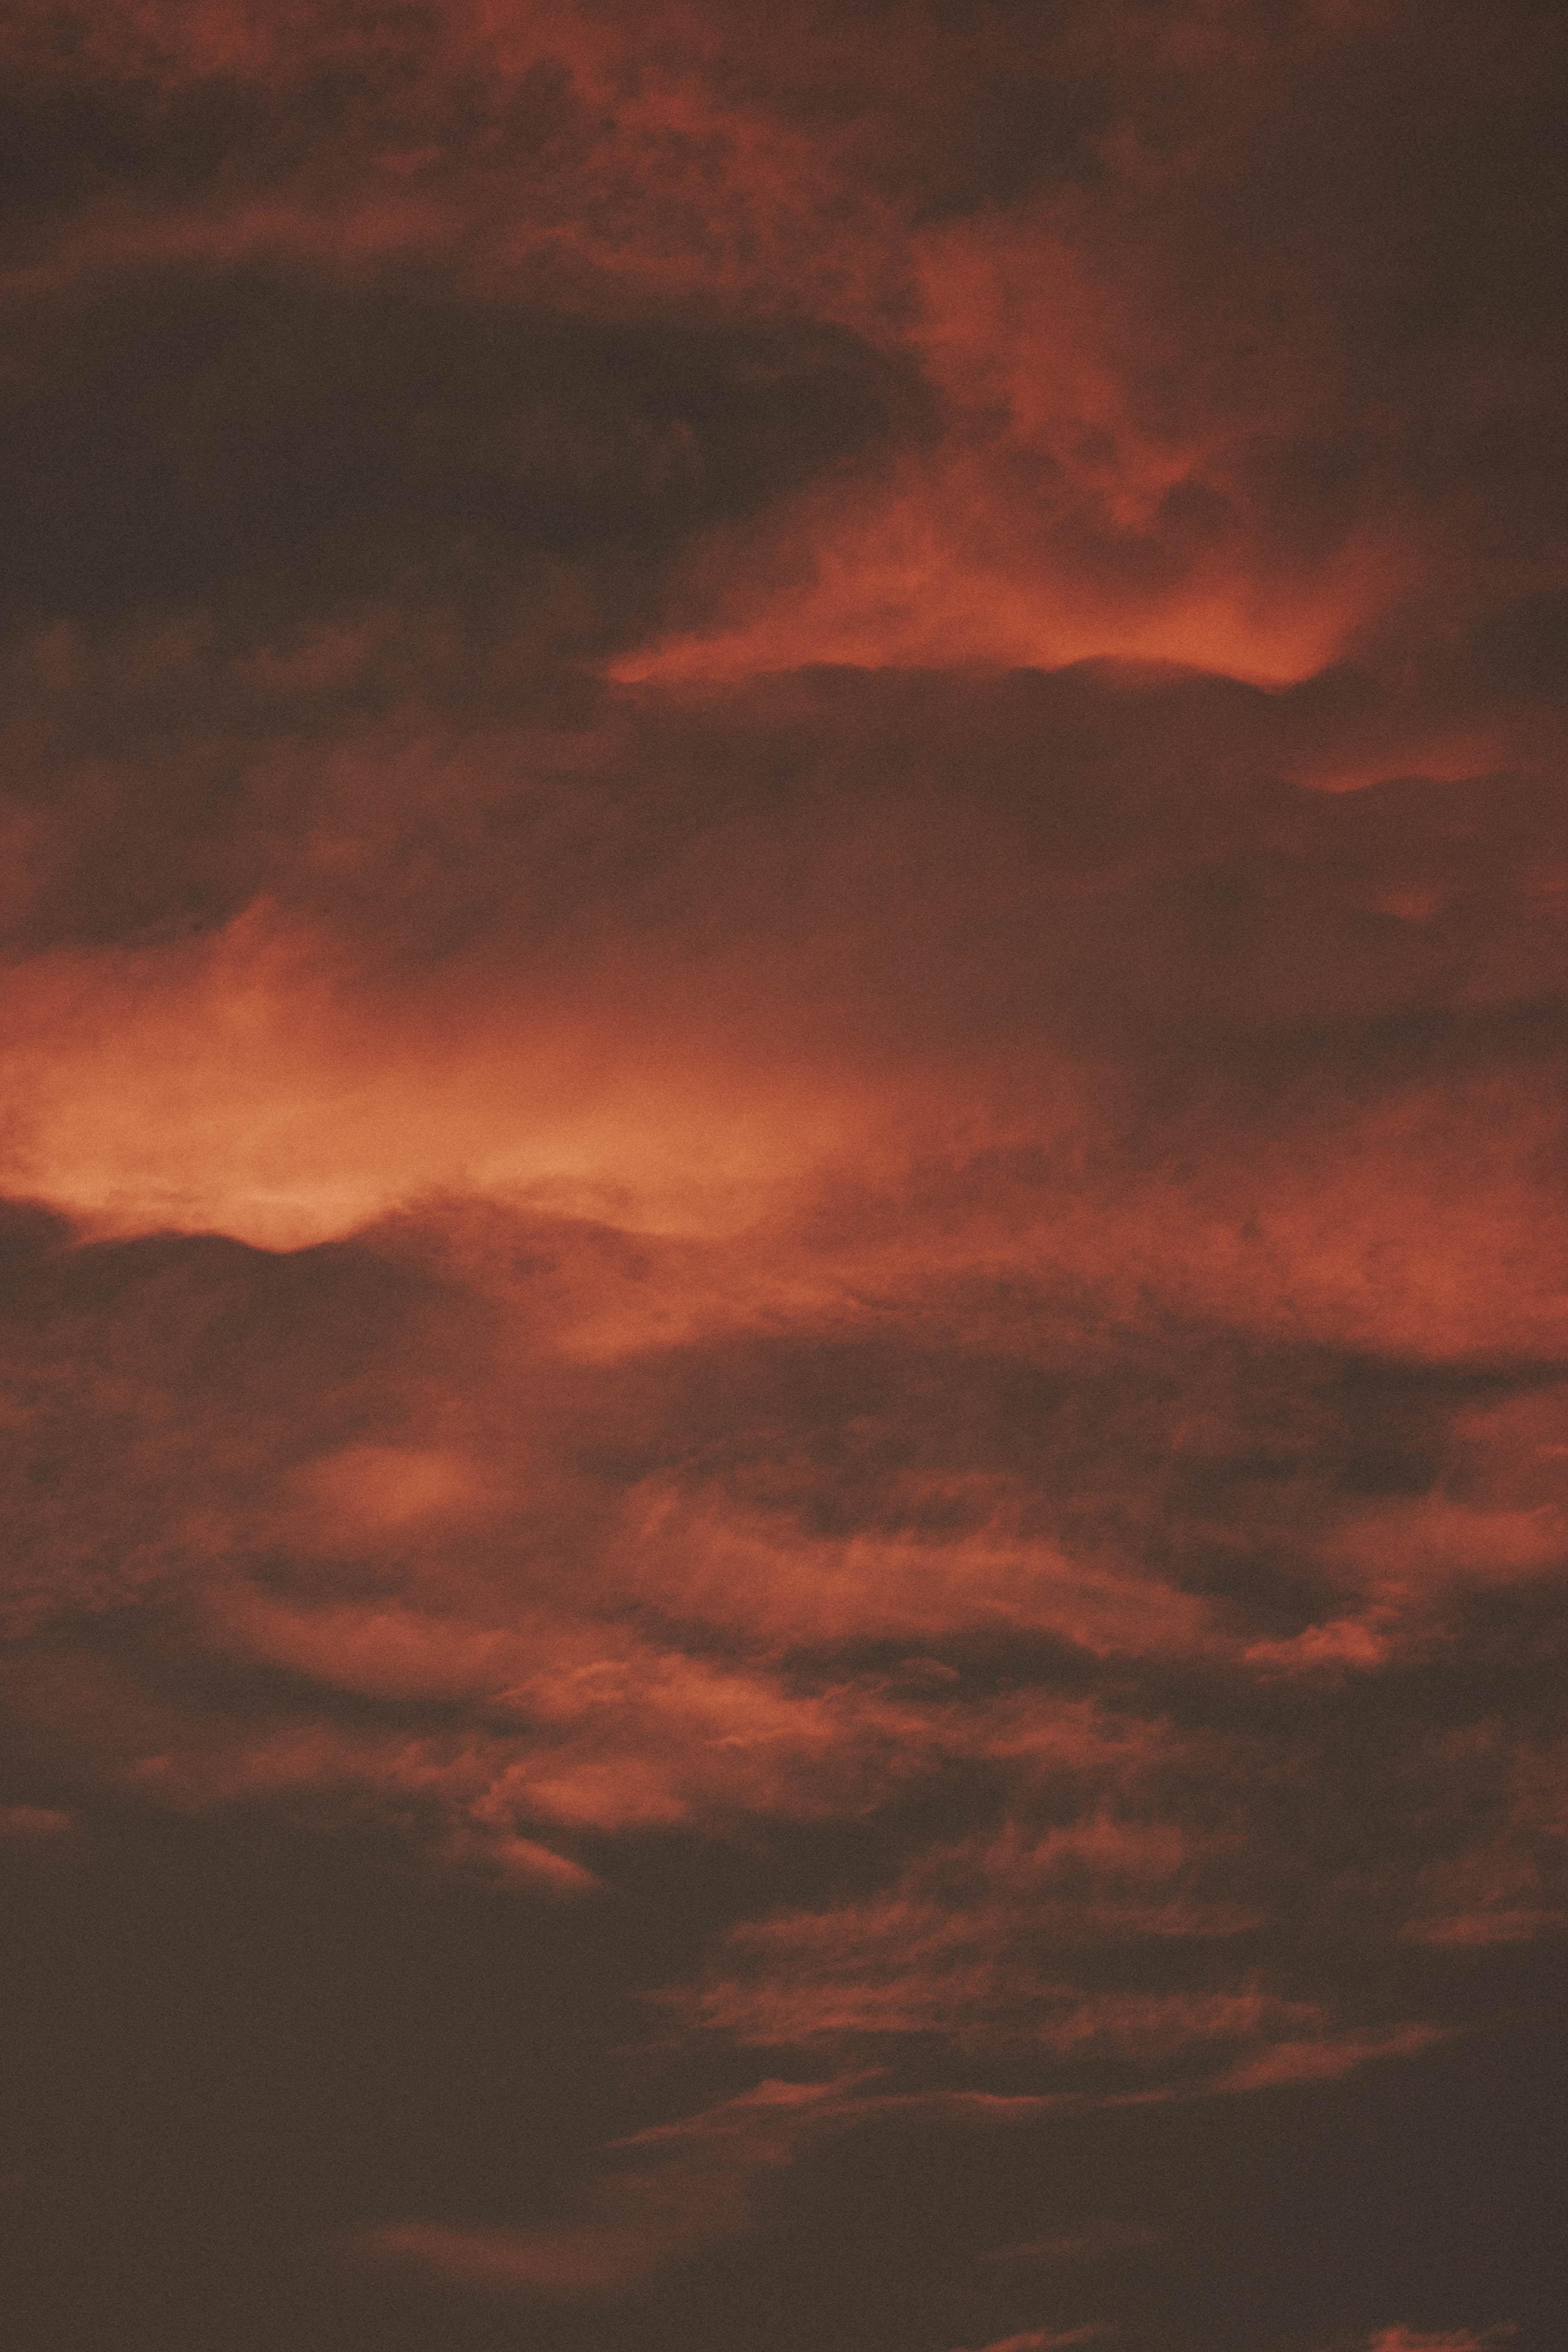 maroon cloudy sky